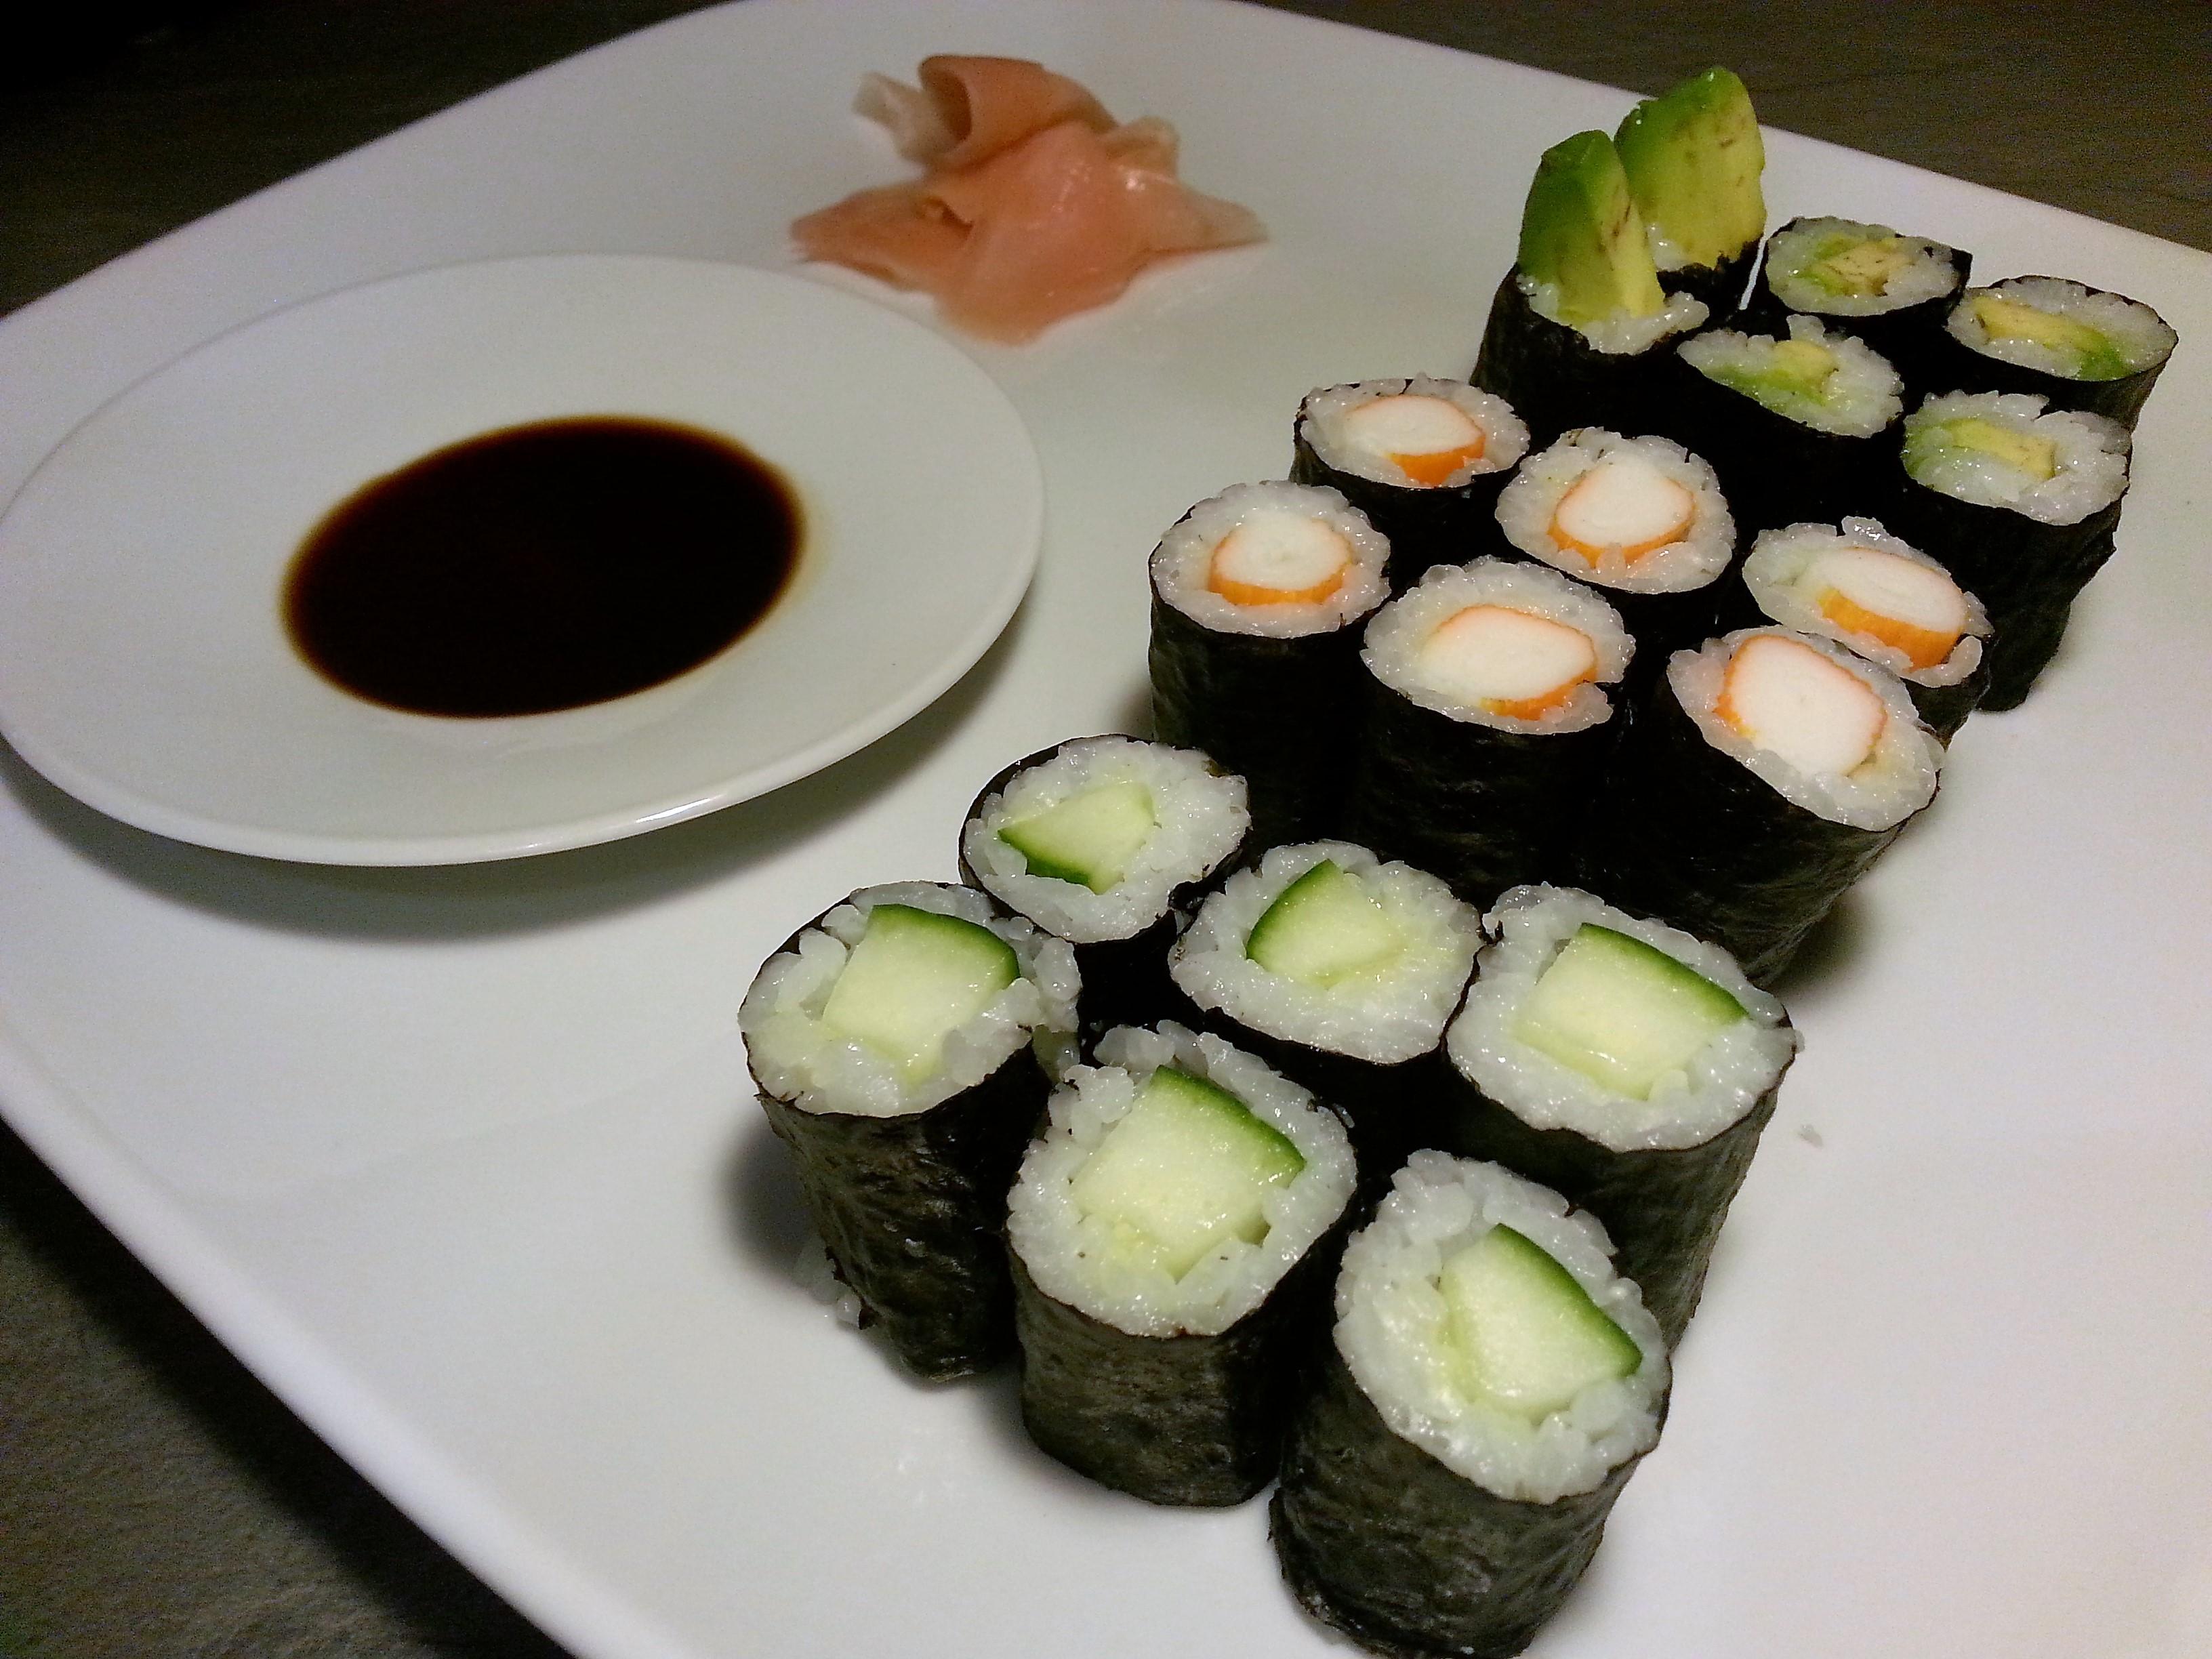 Hoso-Maki Sushi mit Avckado, Gurke und Surimi